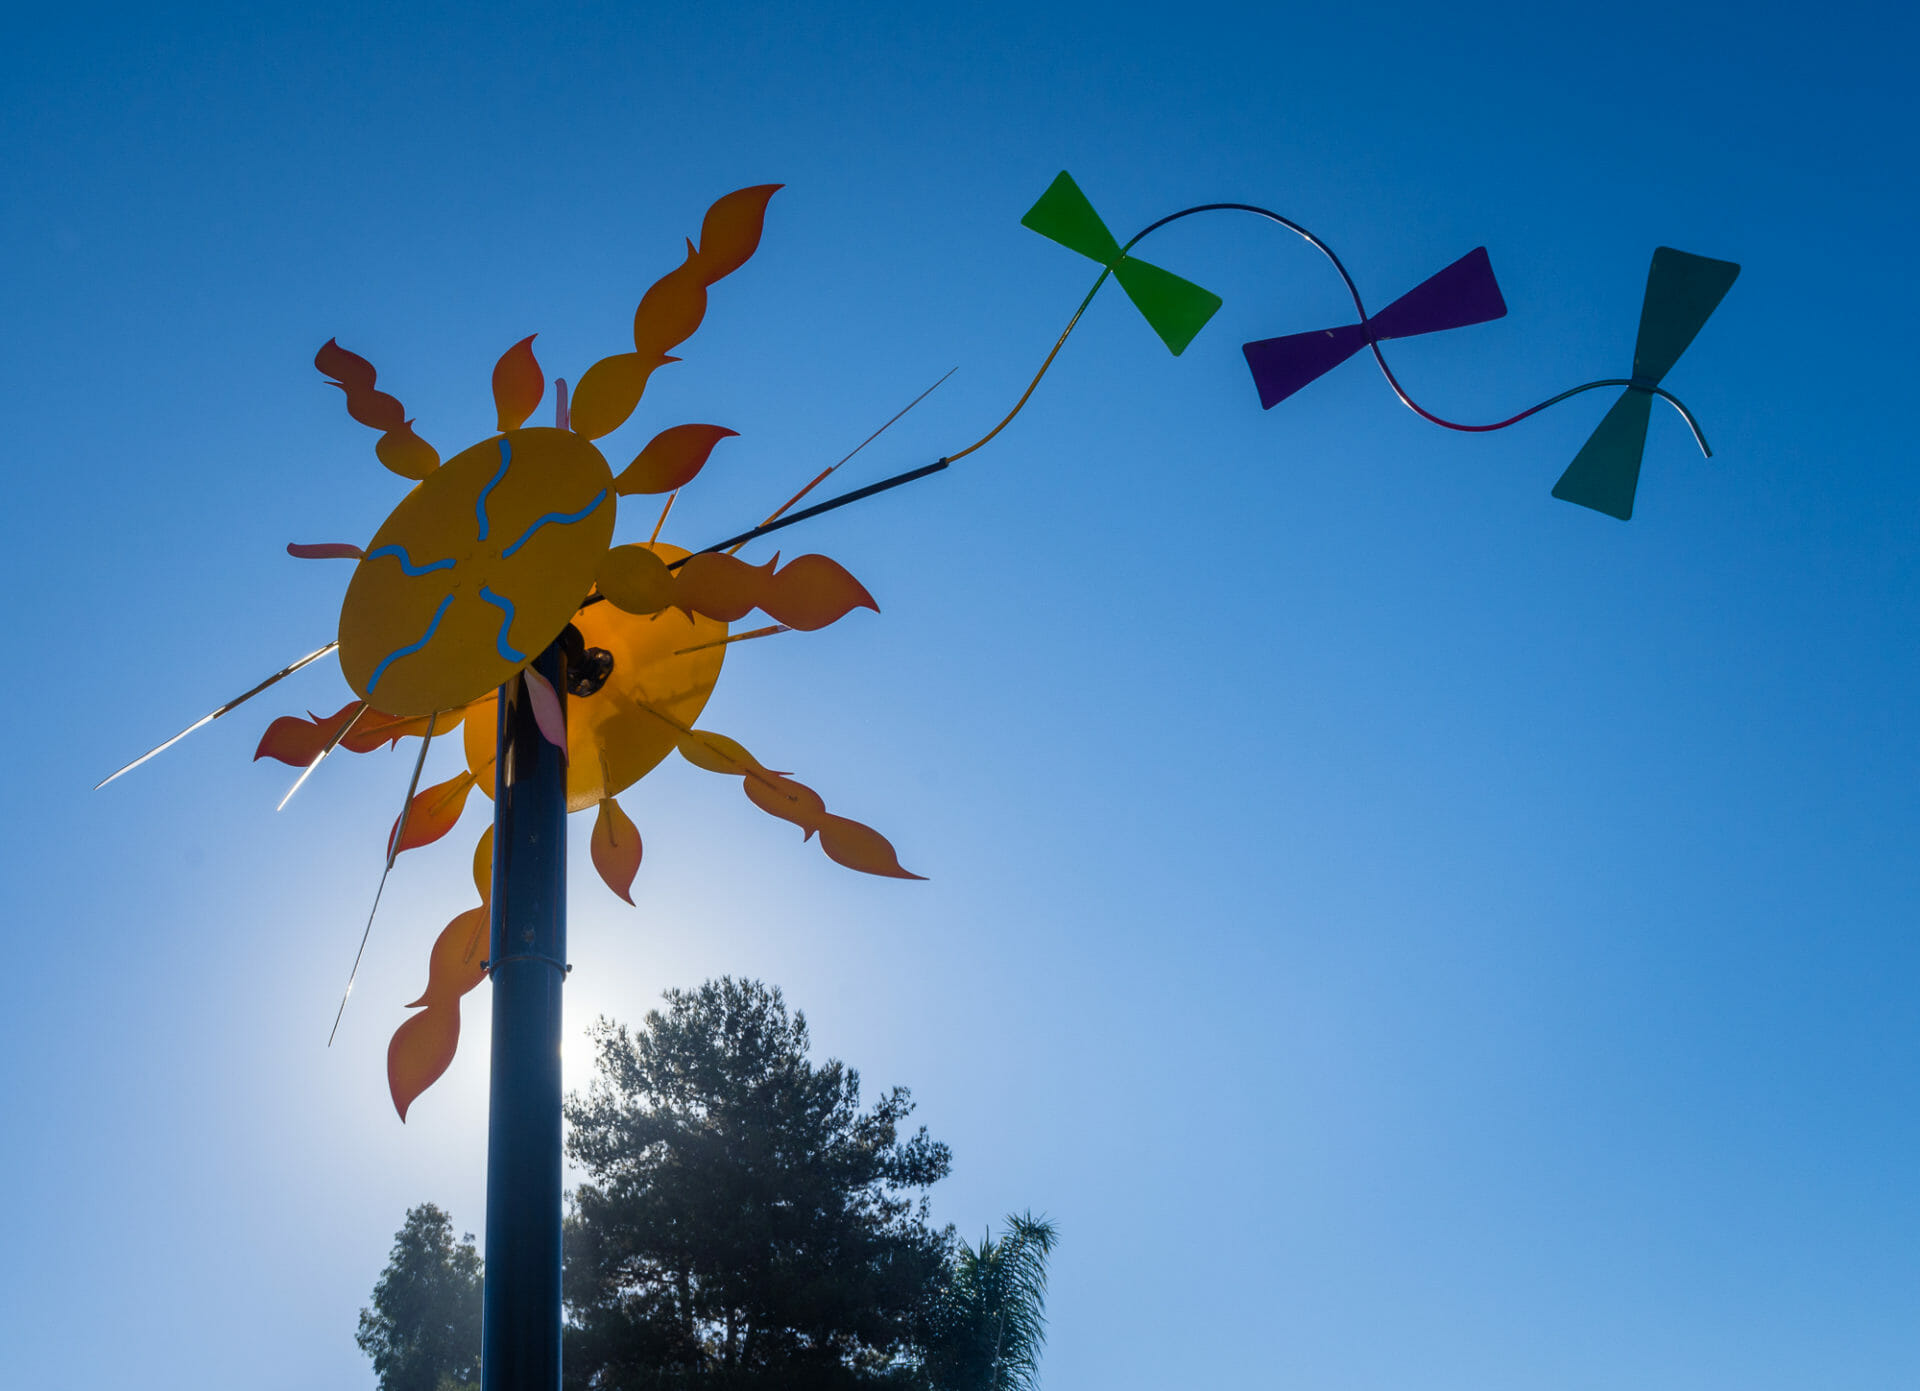 Winds of Change - Kites Over Vista Public Art